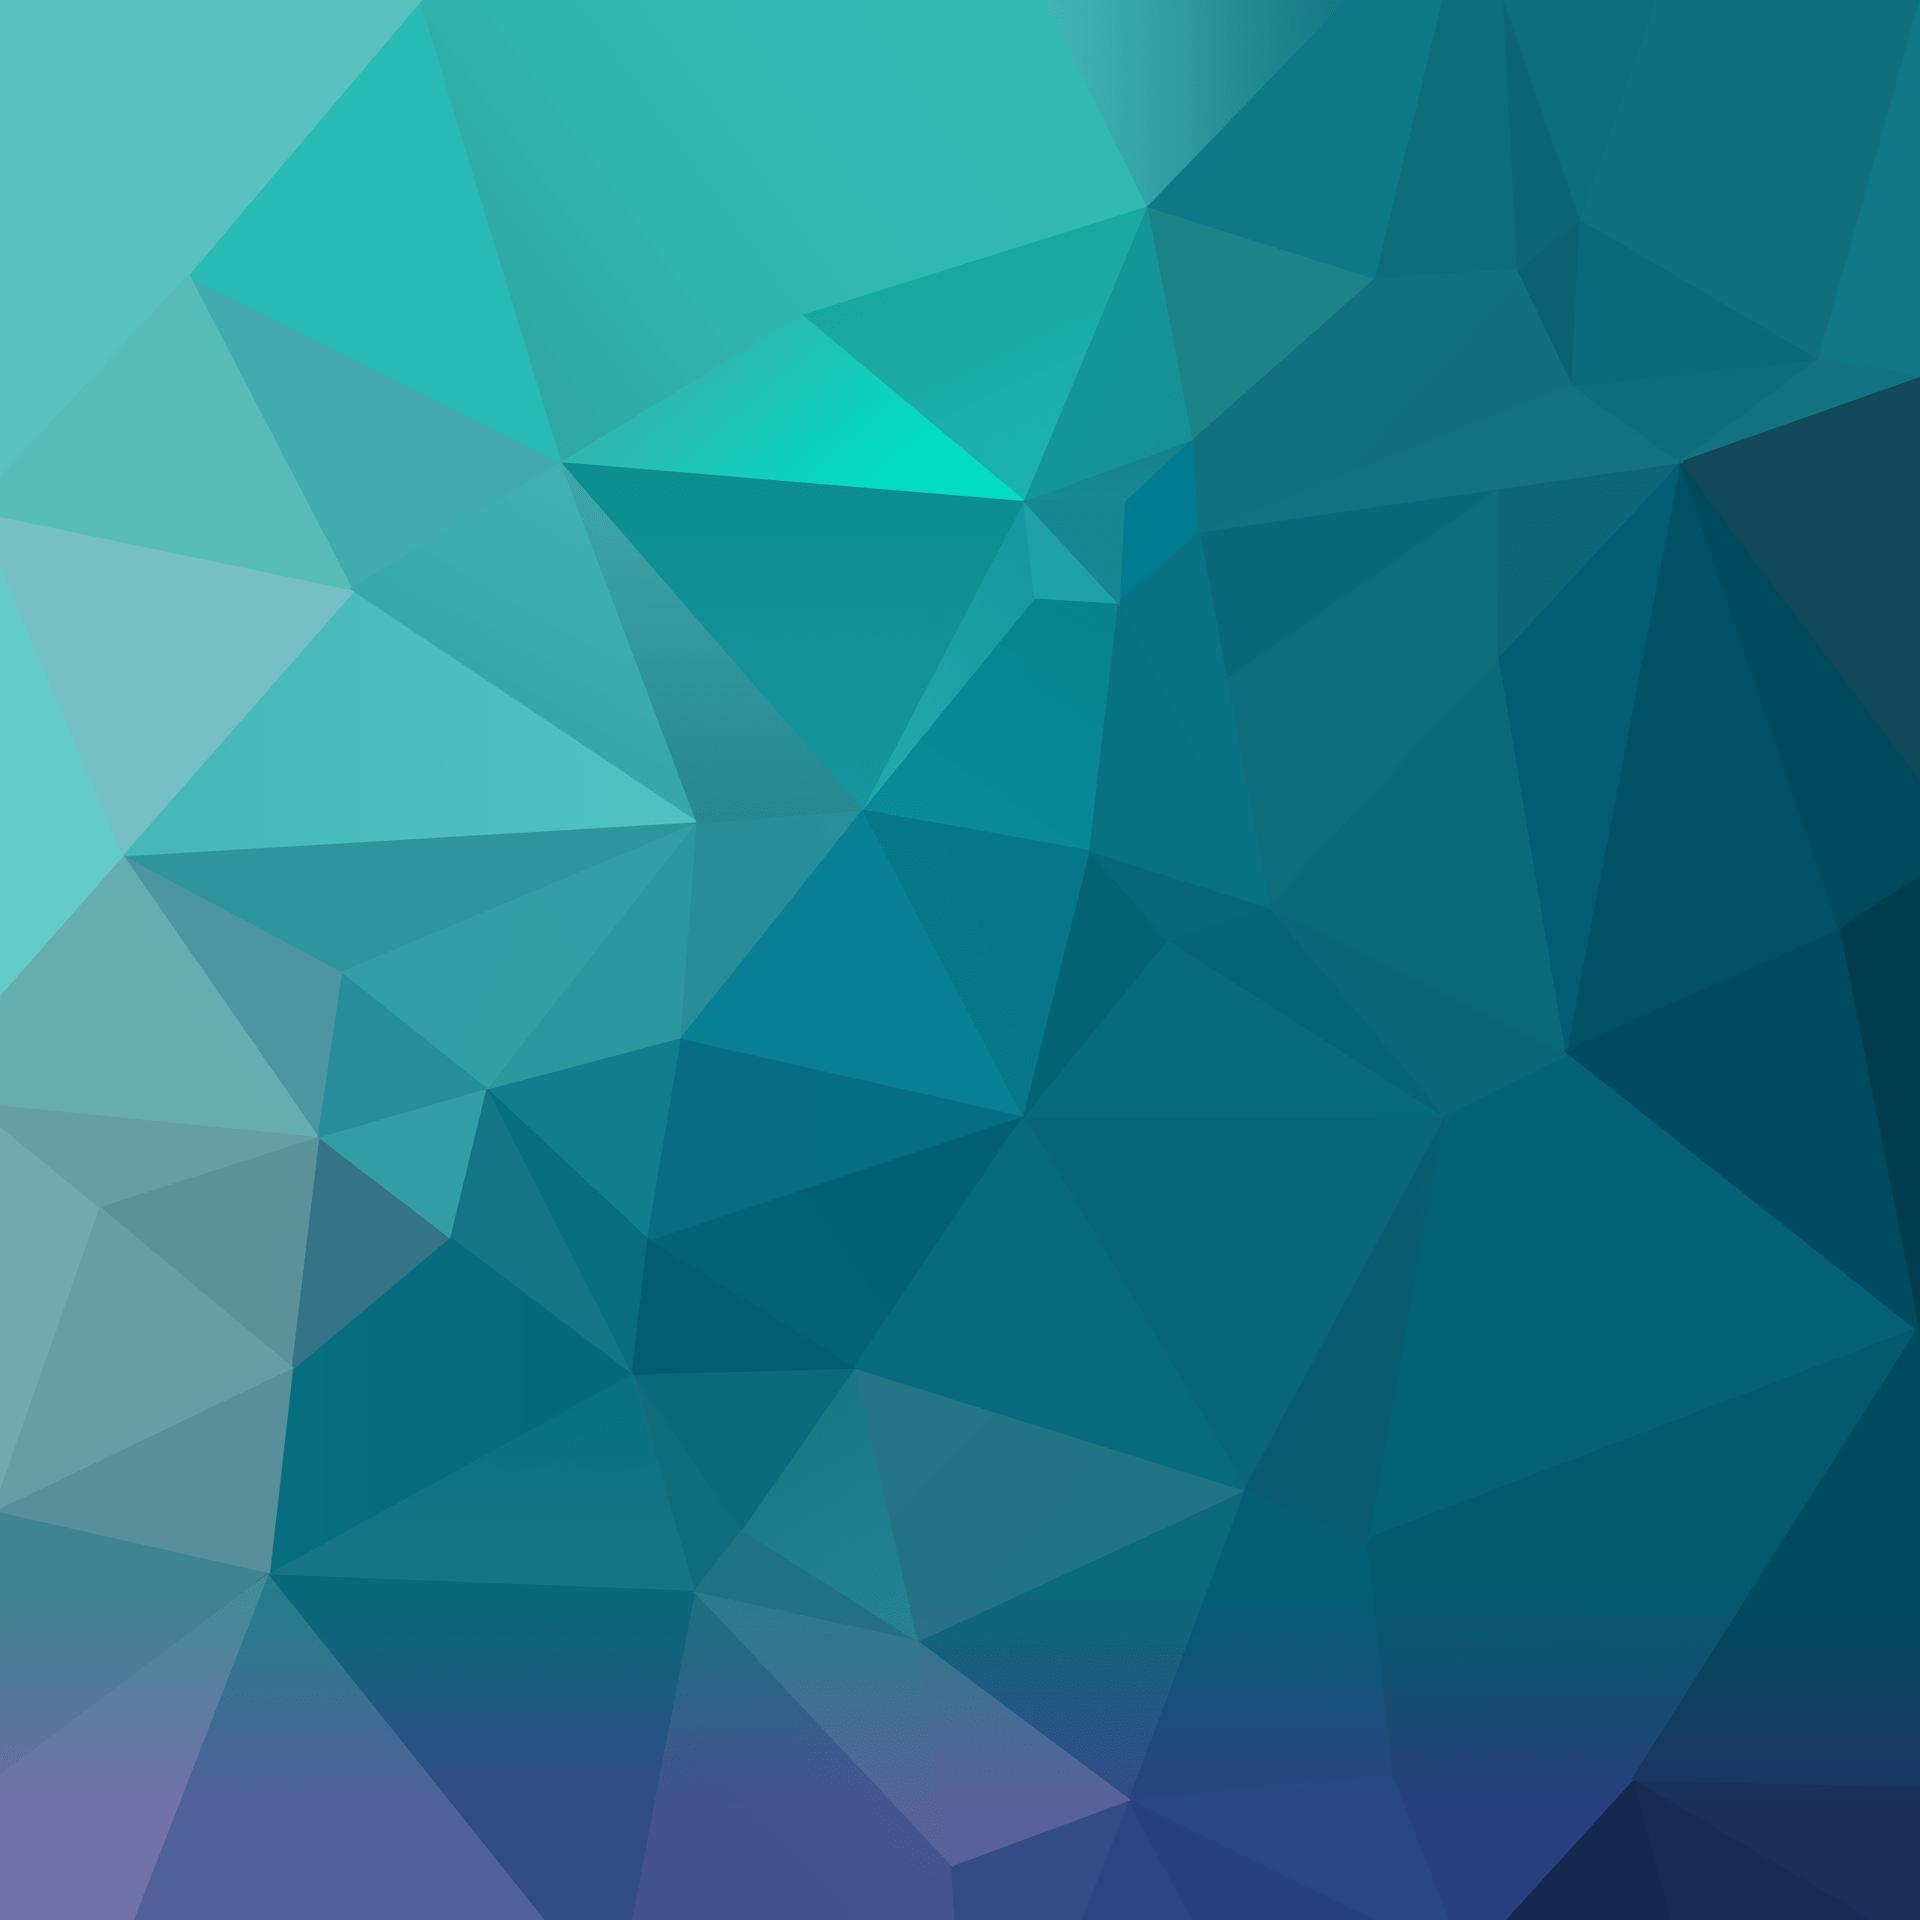 Samsung Galaxy Desktop Wallpapers Top Free Samsung Galaxy Desktop Backgrounds Wallpaperaccess